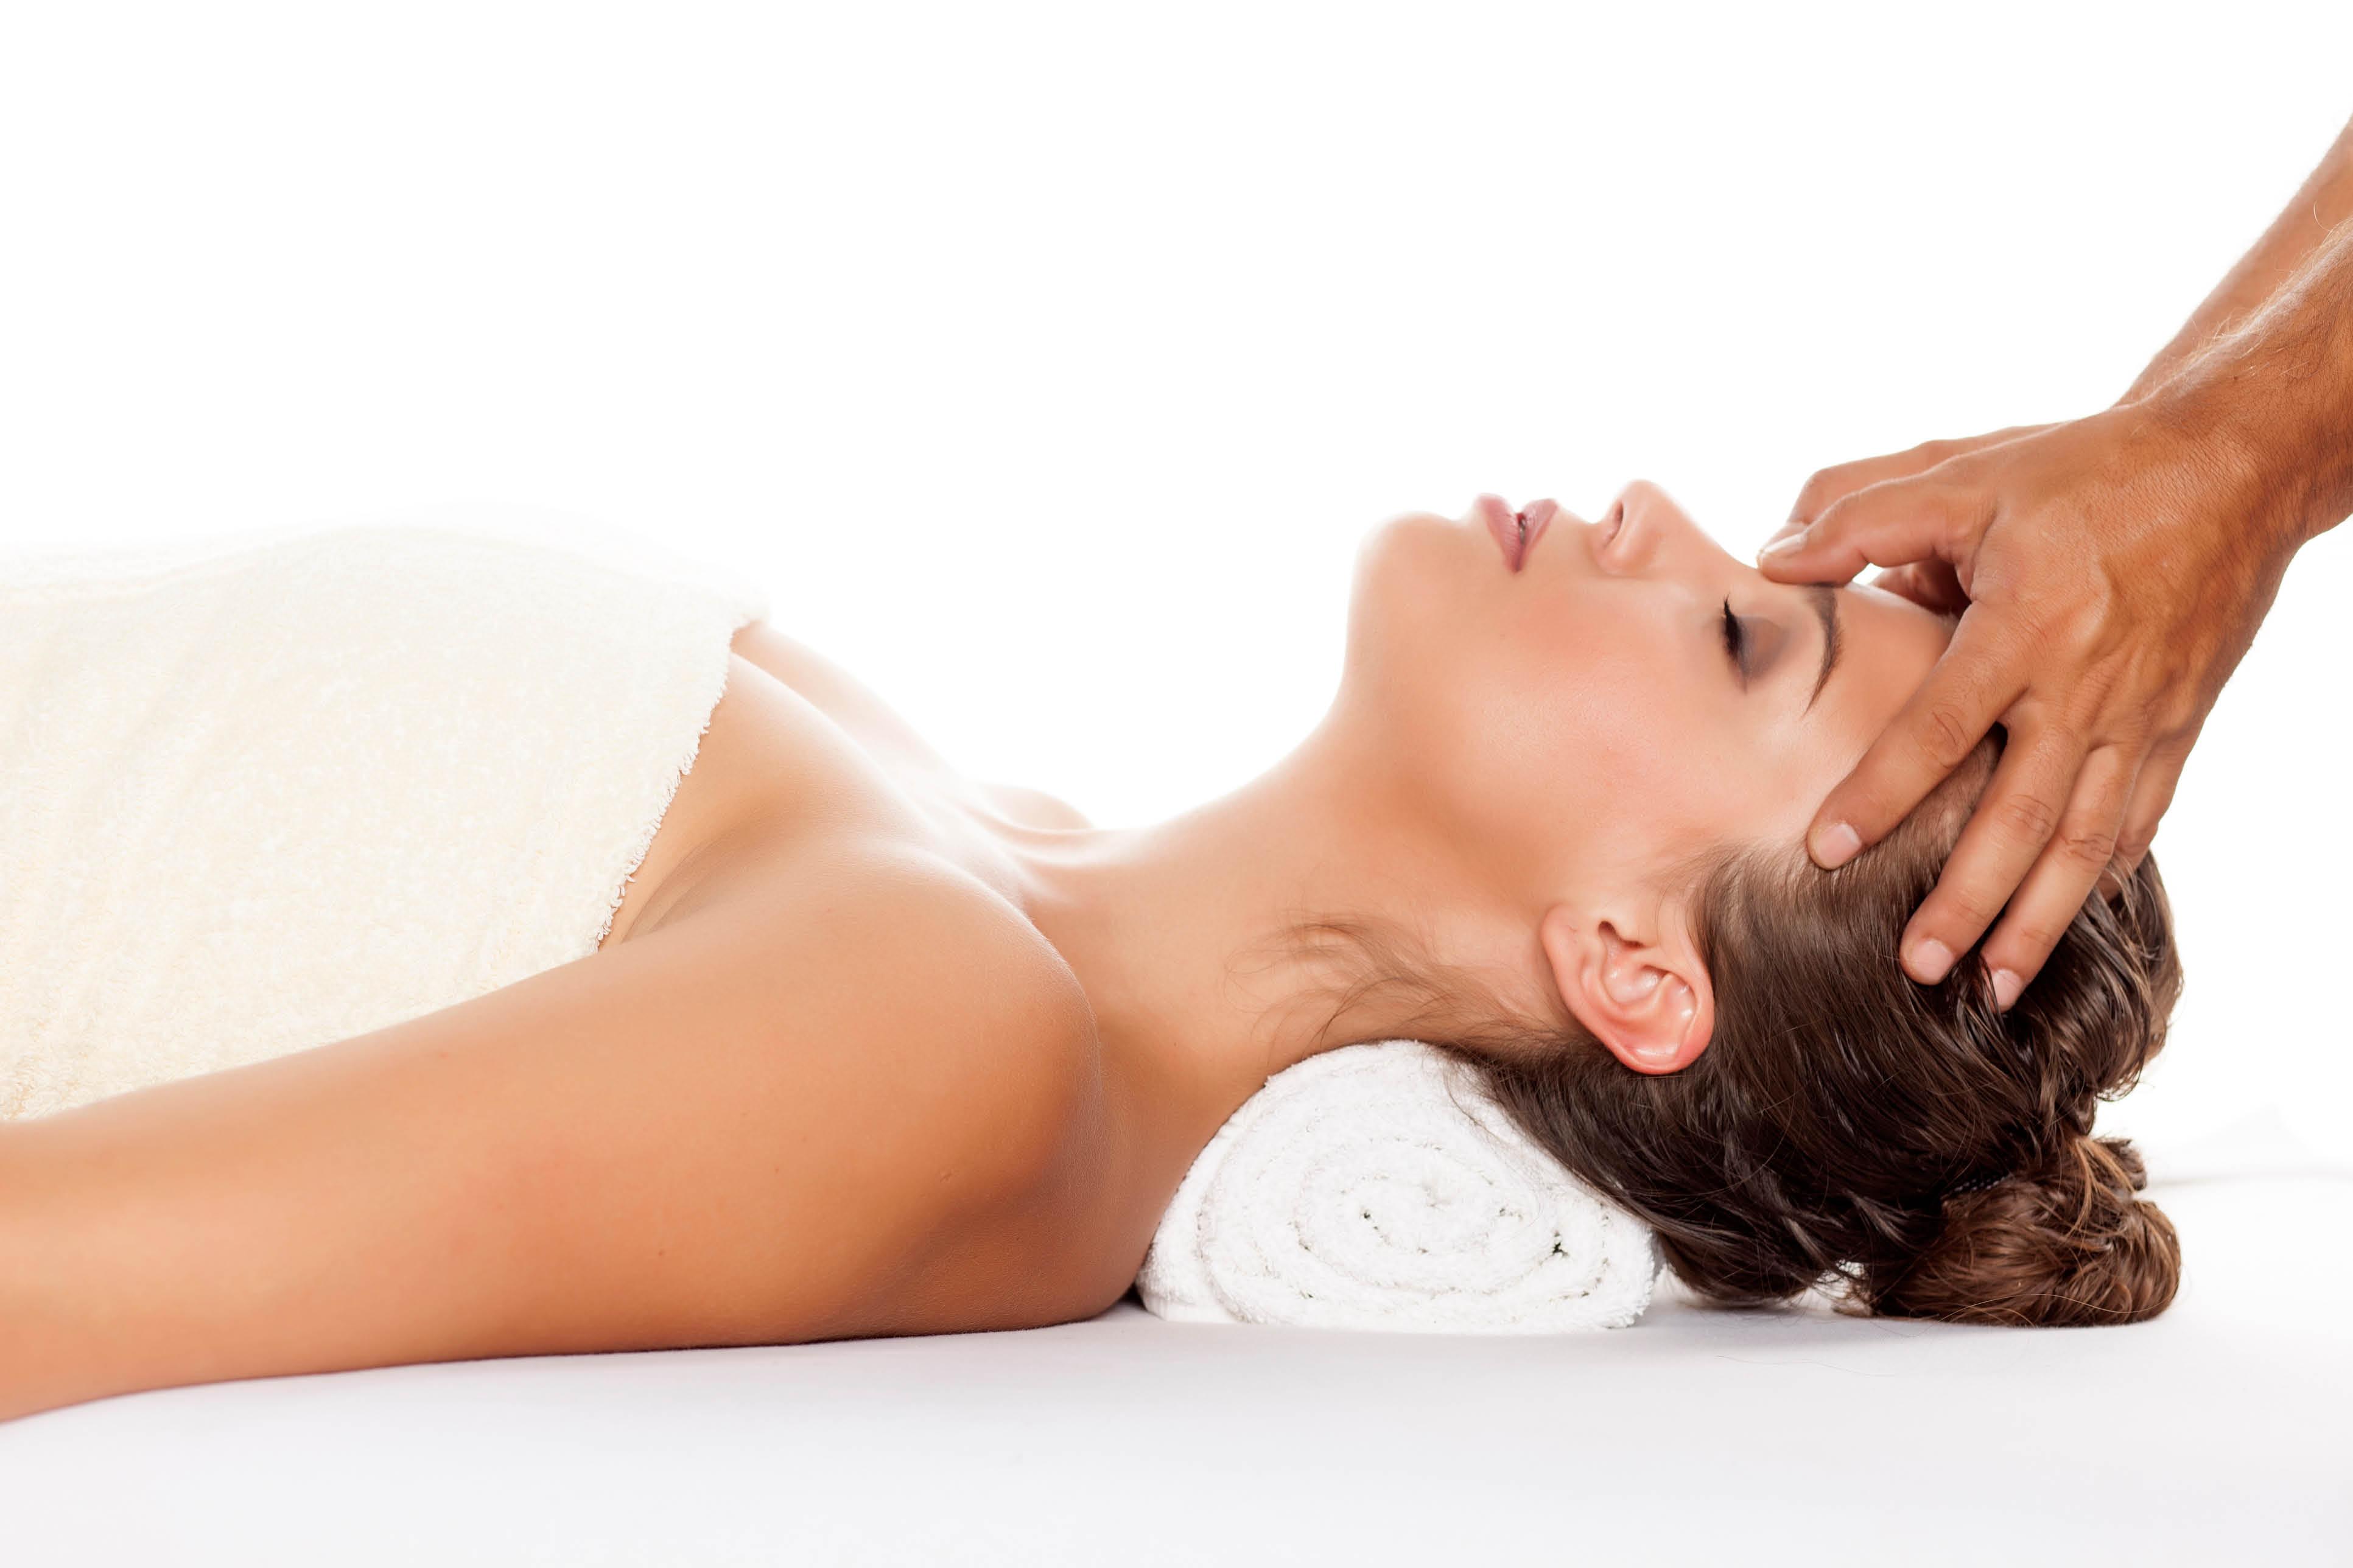 massage envy total body massage and stretch therapy cincinnati ohio